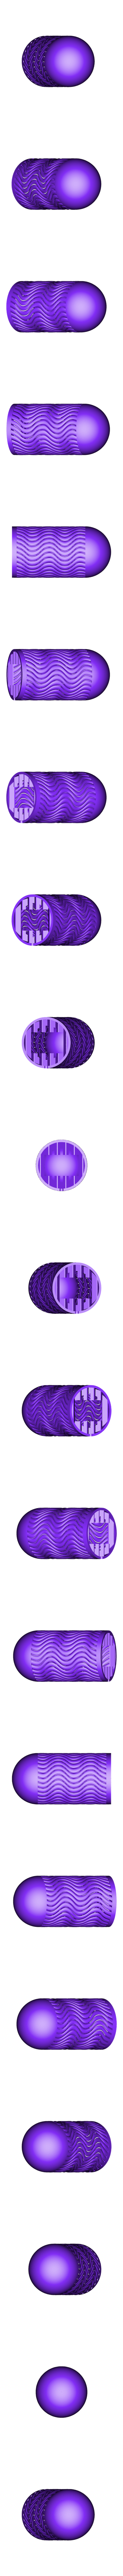 wavelight2.stl Download free STL file Wavelight2 • Design to 3D print, Birk